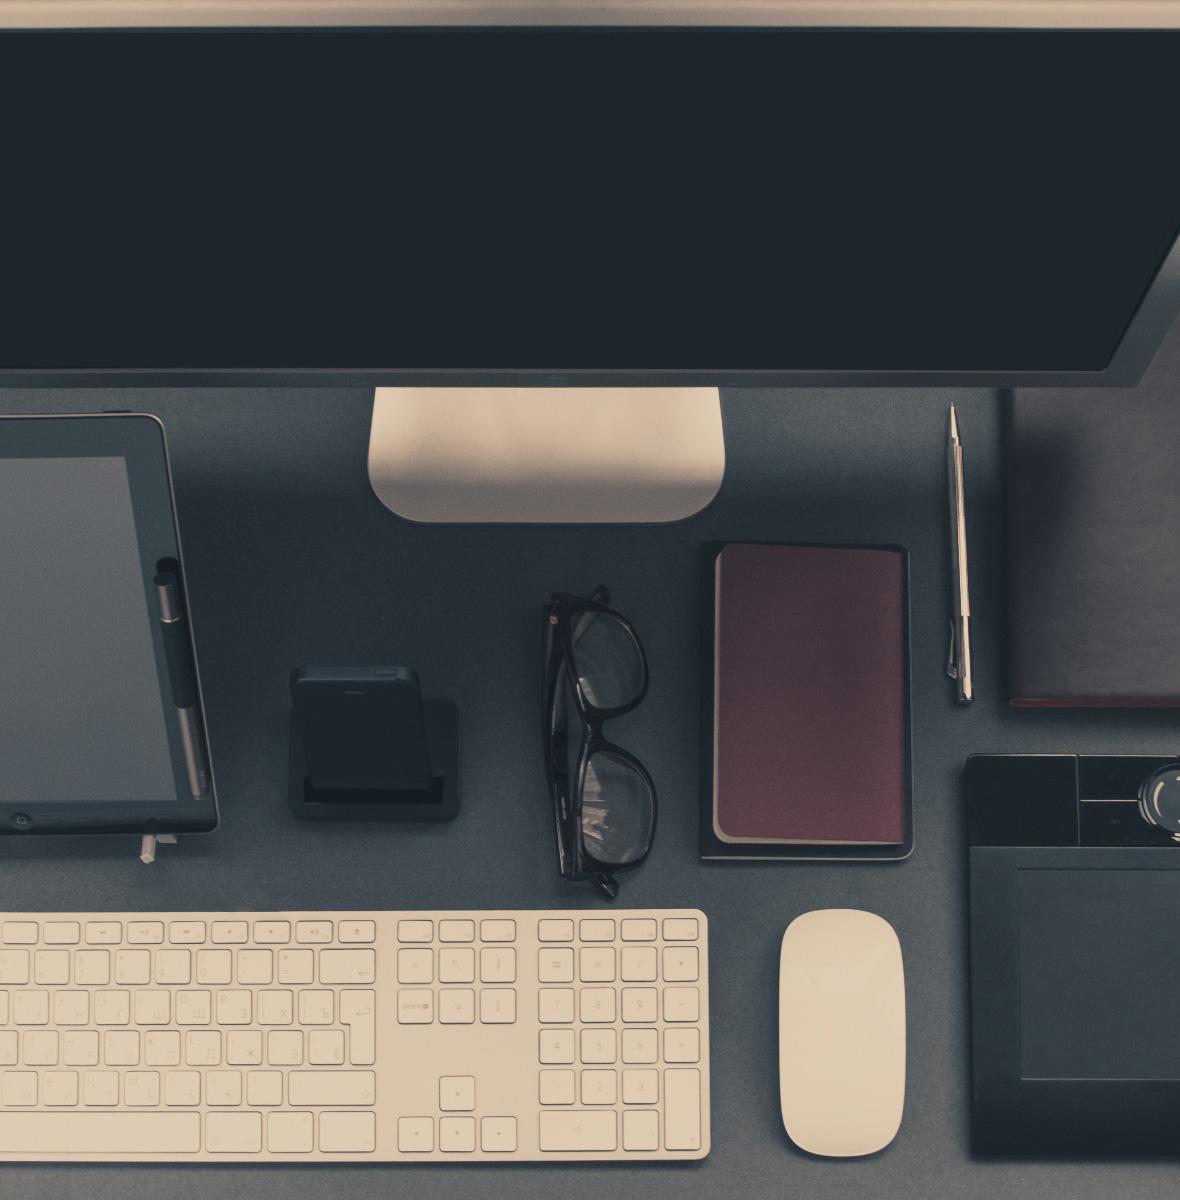 bg workspace